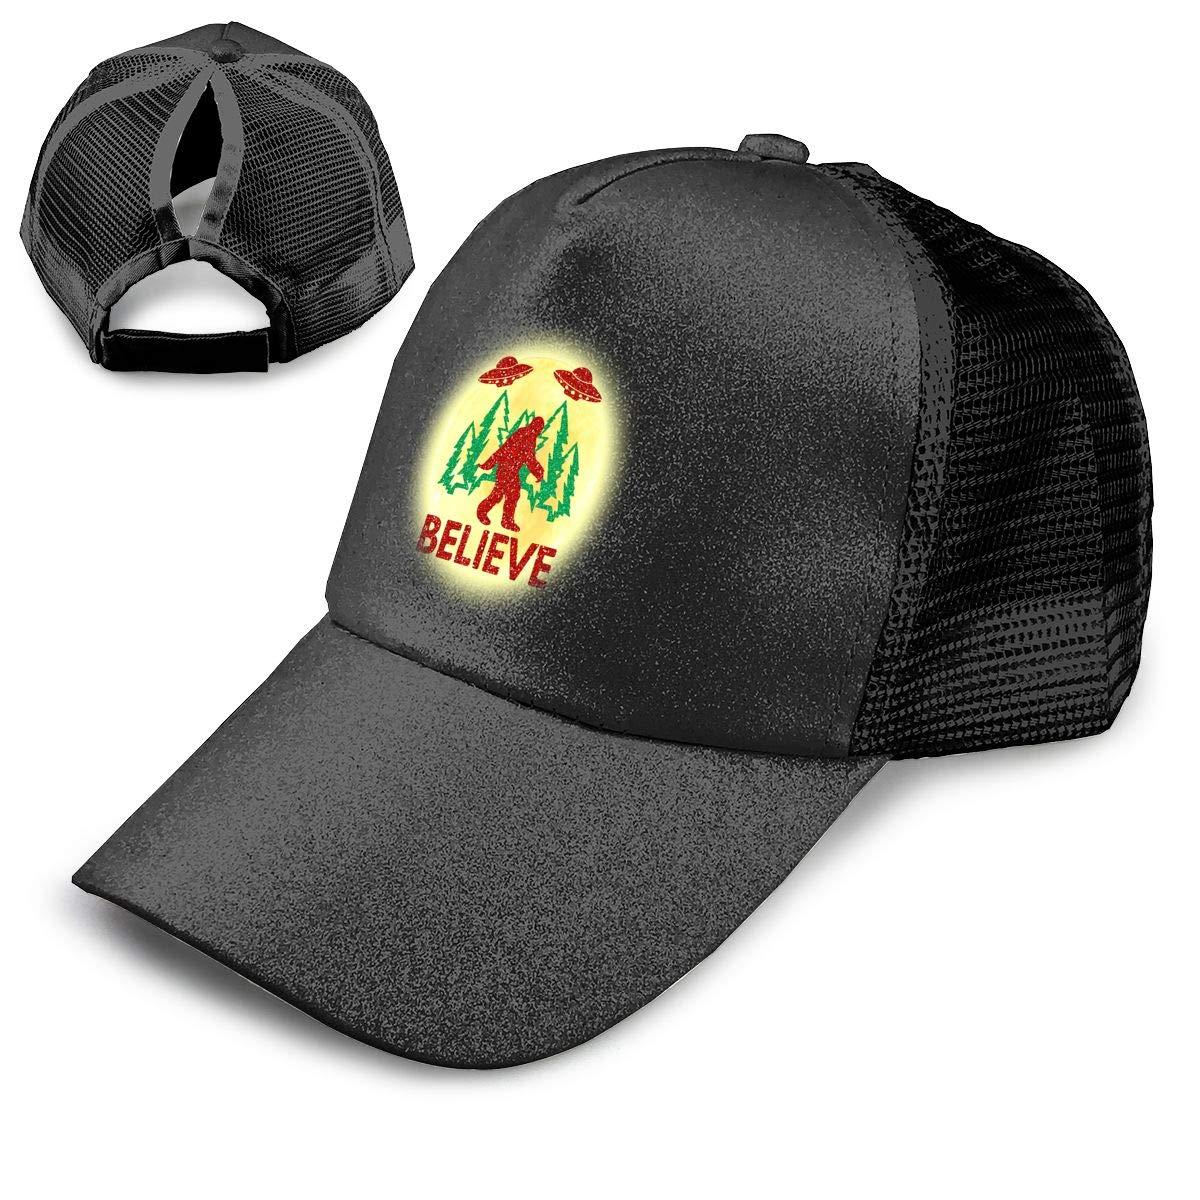 Bigfoot Sasquatch Believe with UFO and Aliens Ponytail Messy High Bun Hat Ponycaps Baseball Cap Adjustable Trucker Cap Mesh Cap